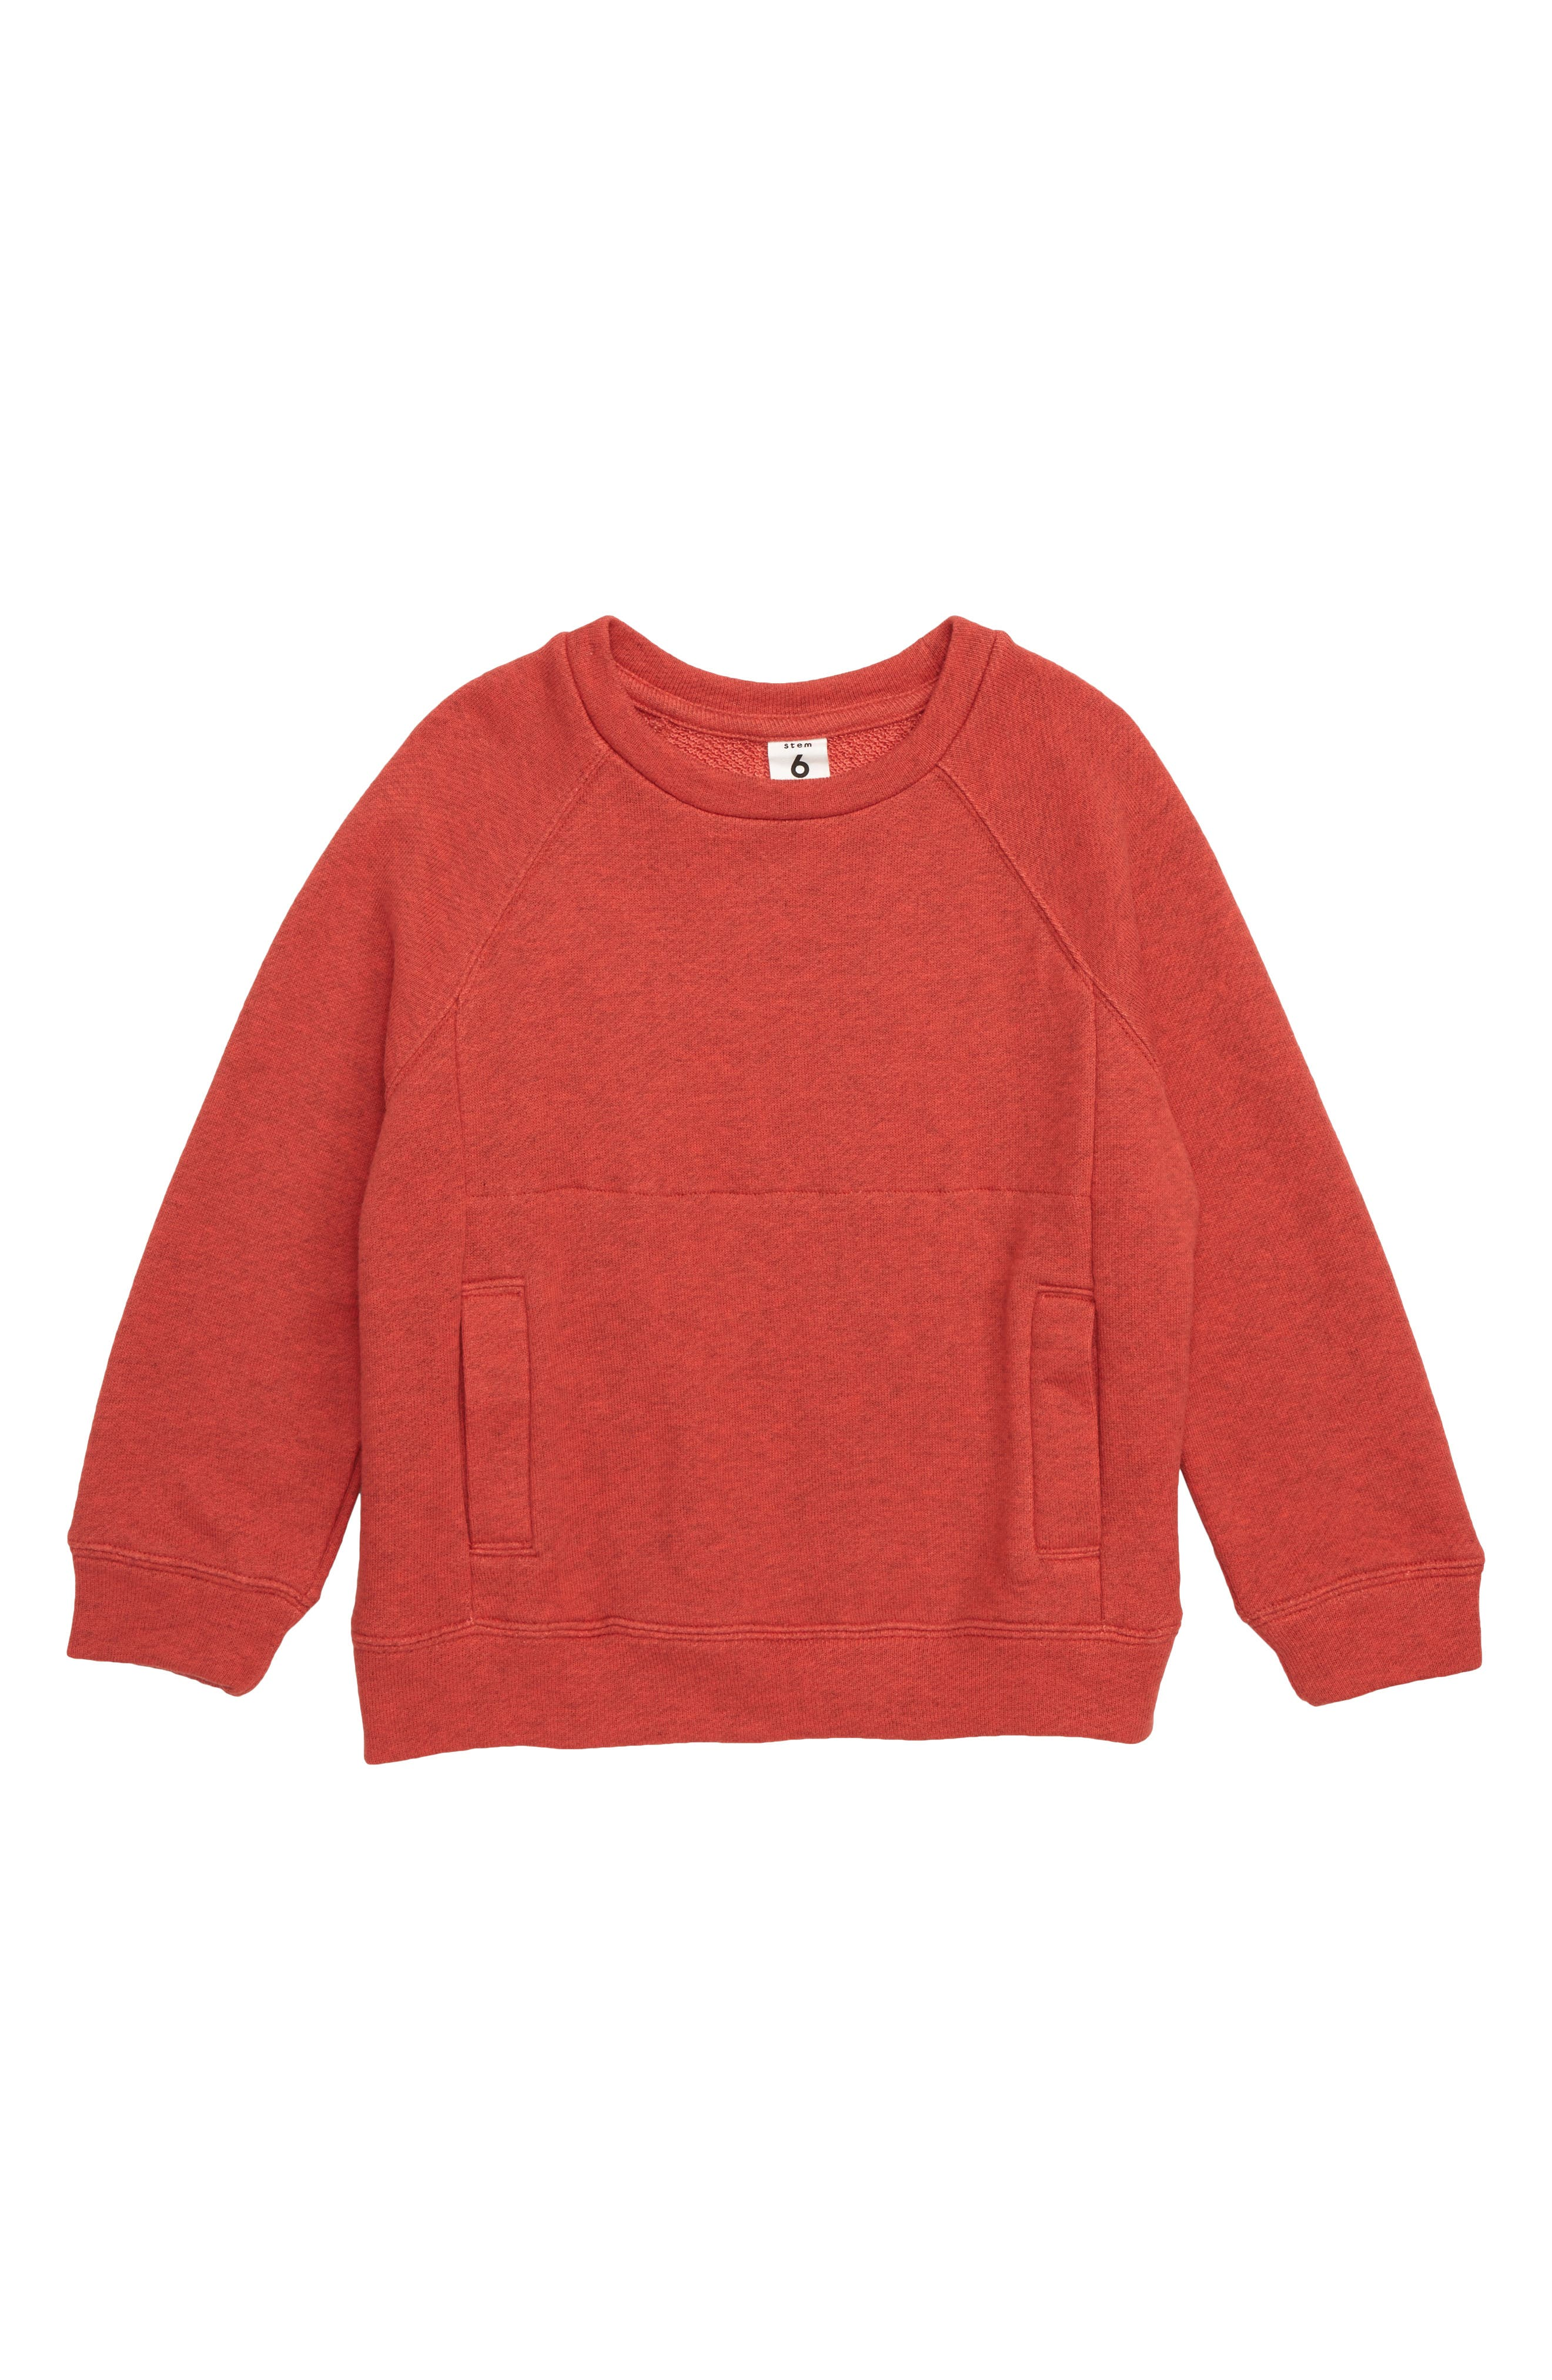 STEM Textured Sweatshirt, Main, color, 610